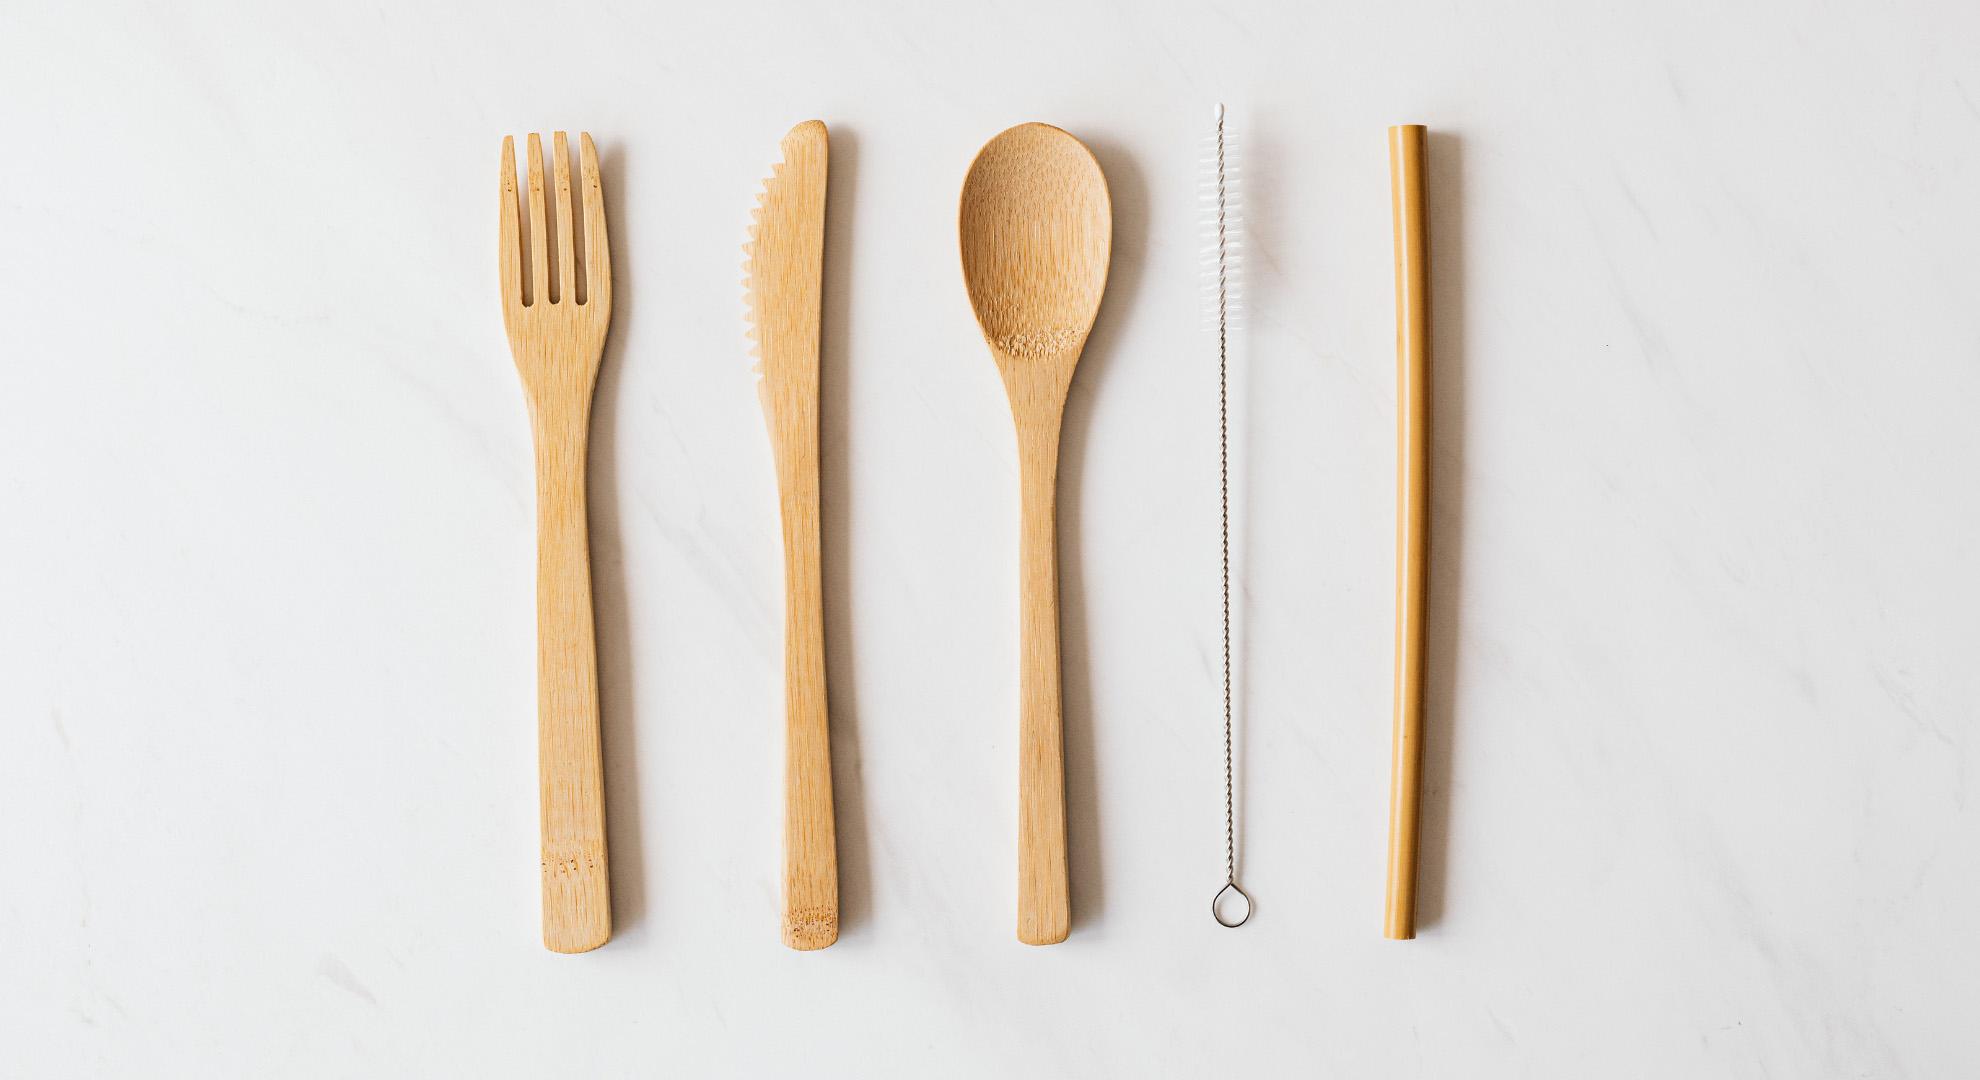 Thinking on the best design for kitchen utensils.